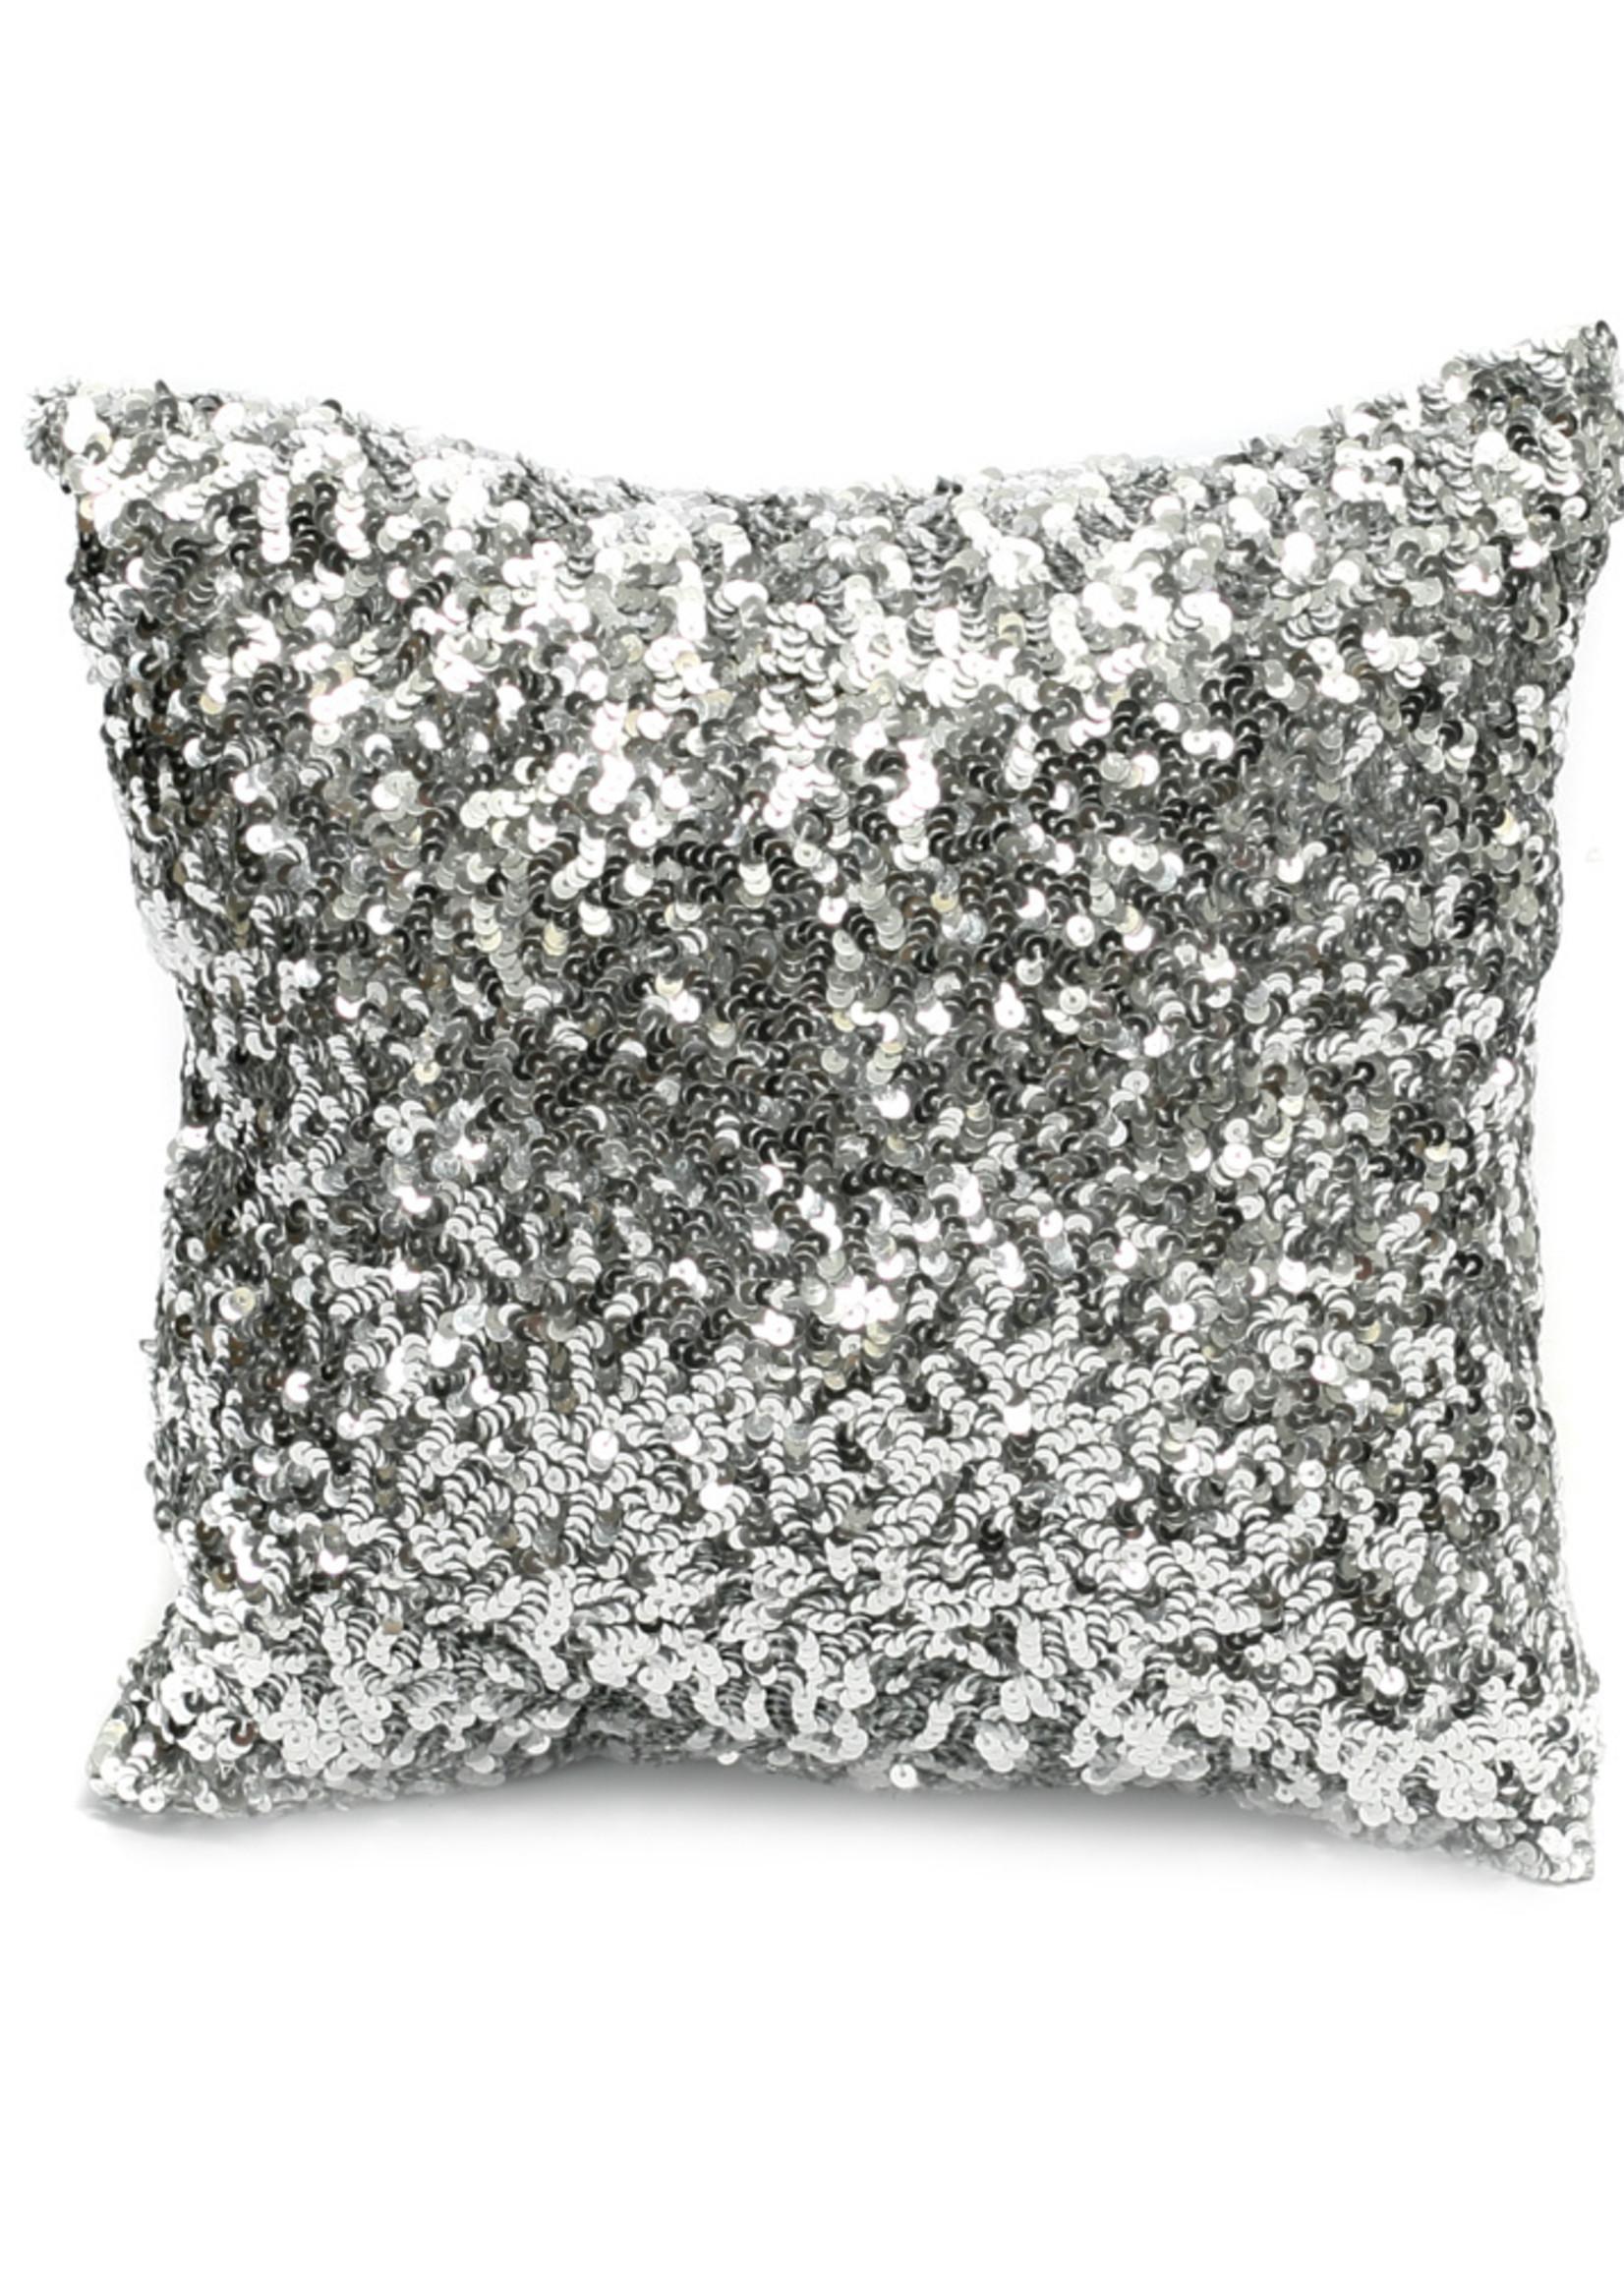 The Glitter Cushion - Silver